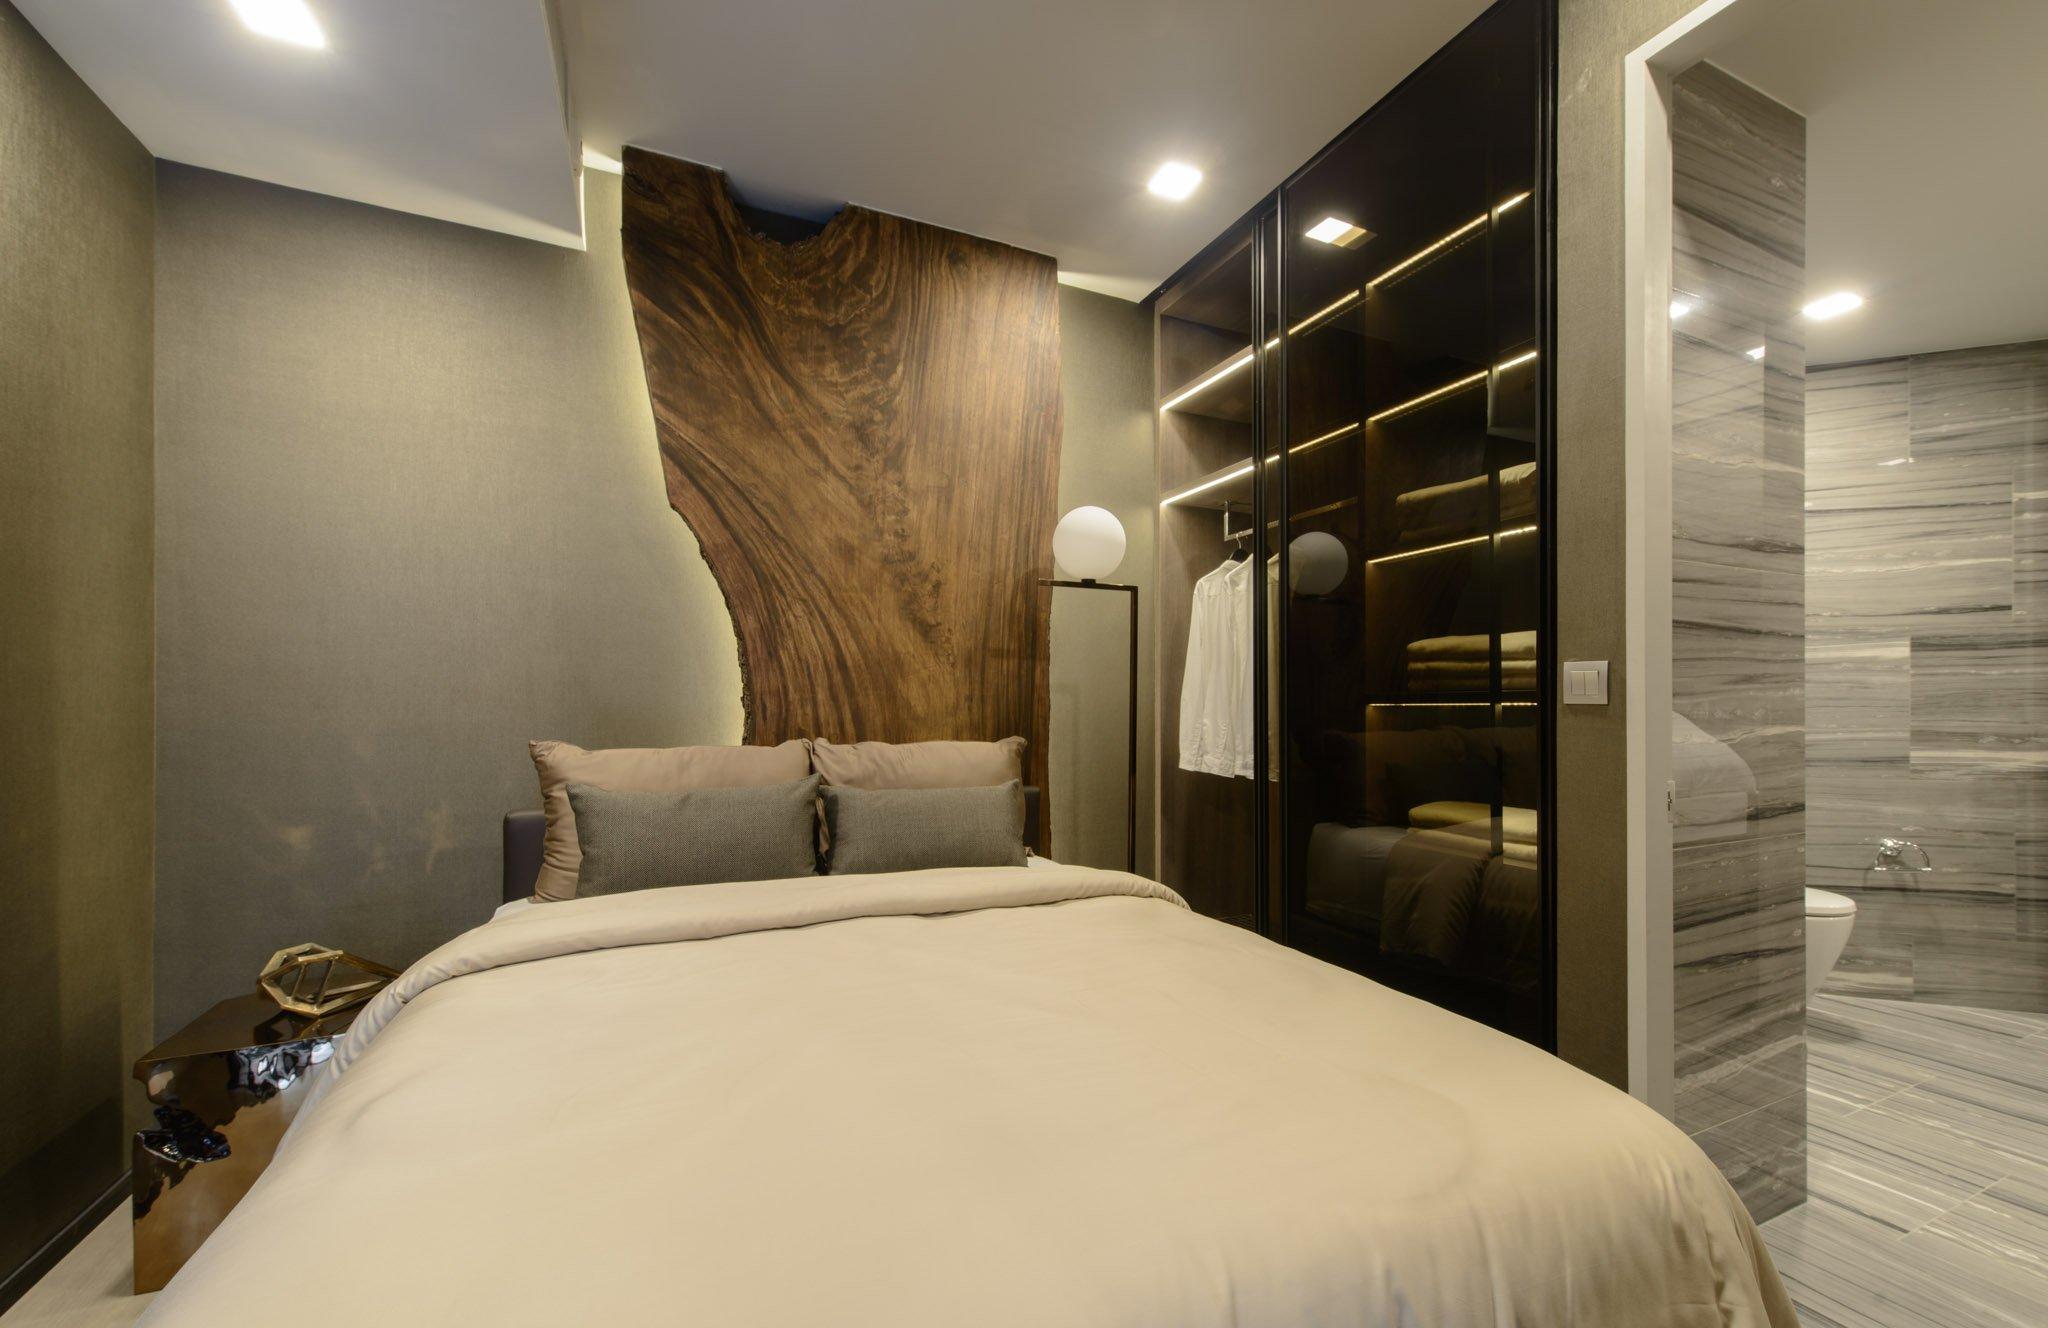 ASHTON Residence 41 Yours. For Keeps. 26 - Ananda Development (อนันดา ดีเวลลอปเม้นท์)